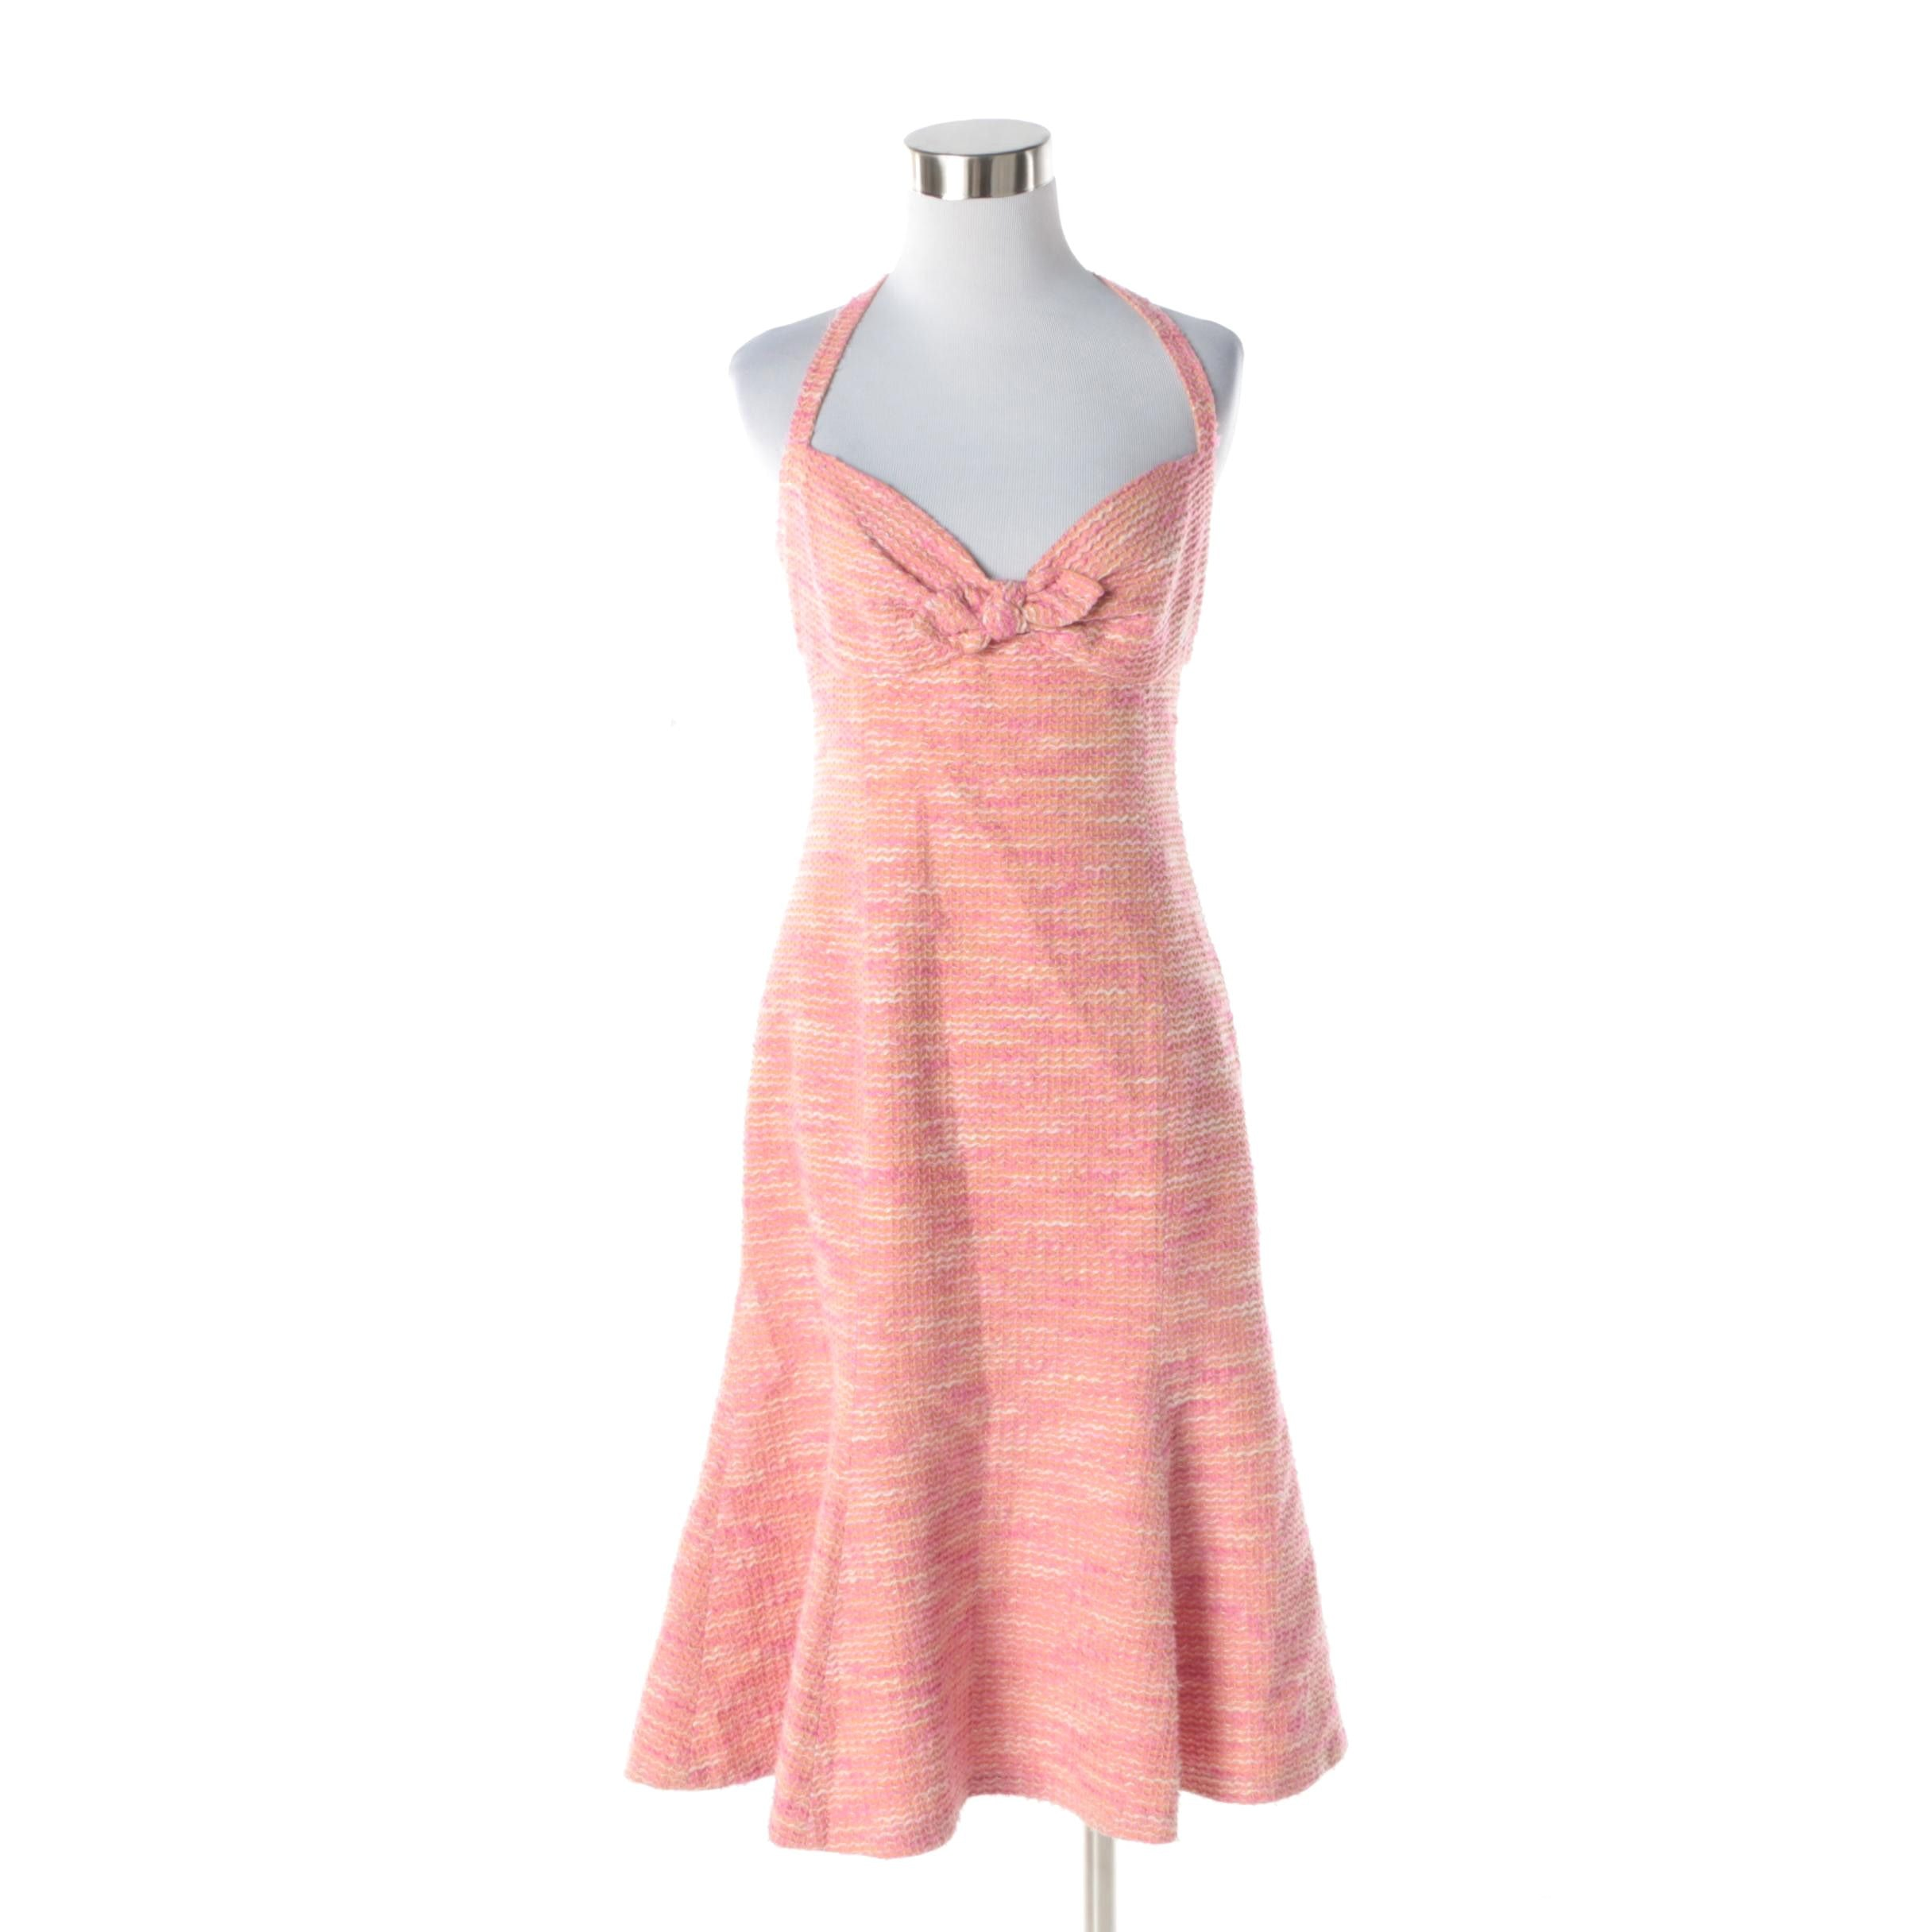 Moschino Cheap and Chic Satin Halter Dress